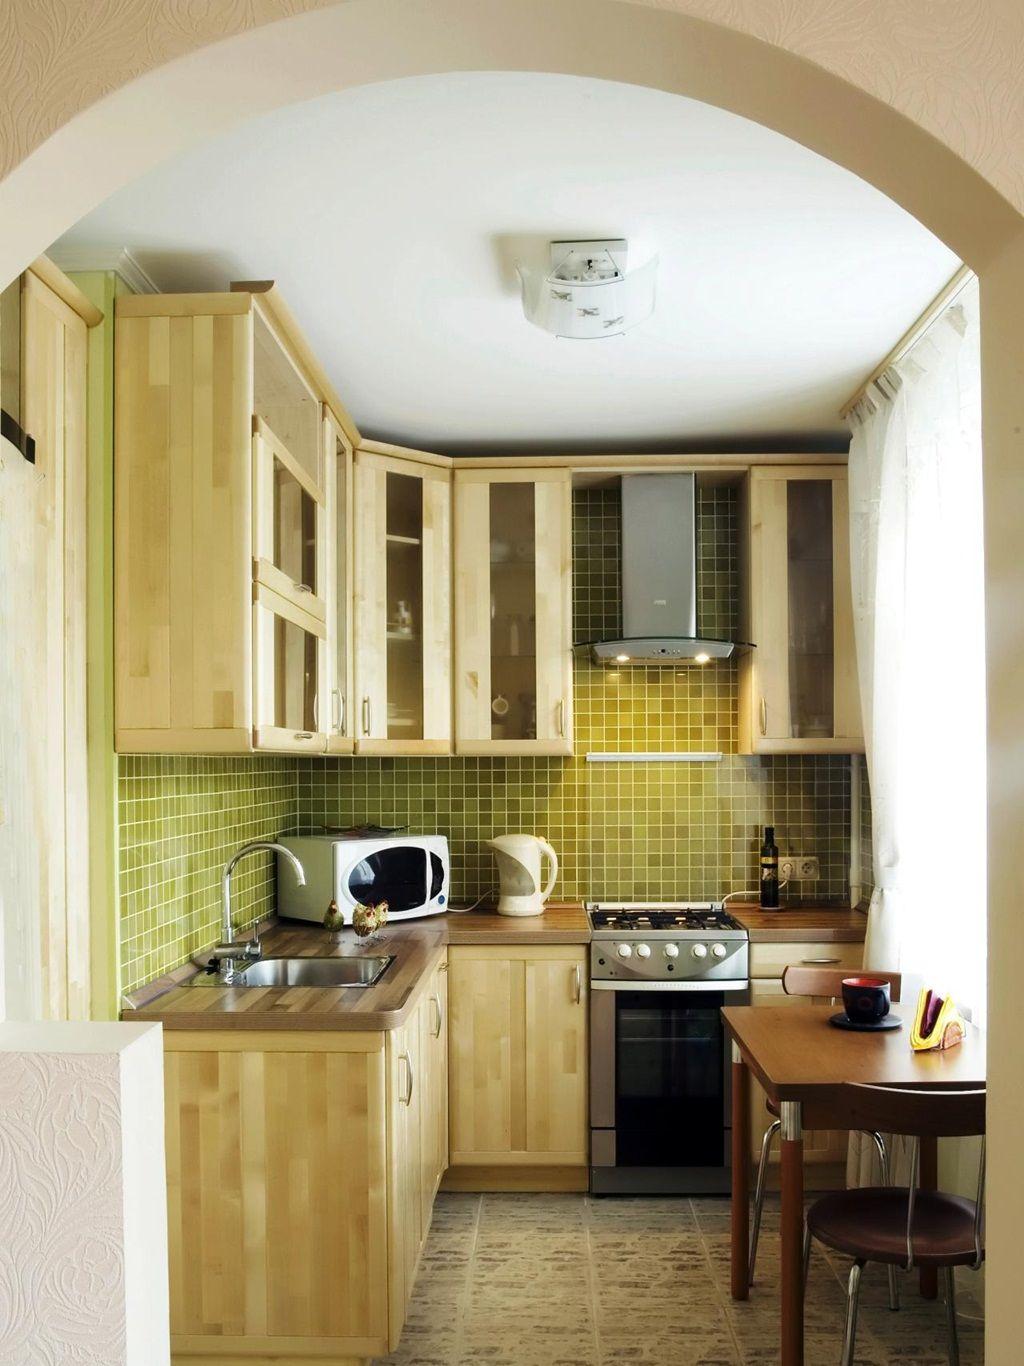 Tiny but Useful Kitchens – 9 Genius Ideas for Maximum ...